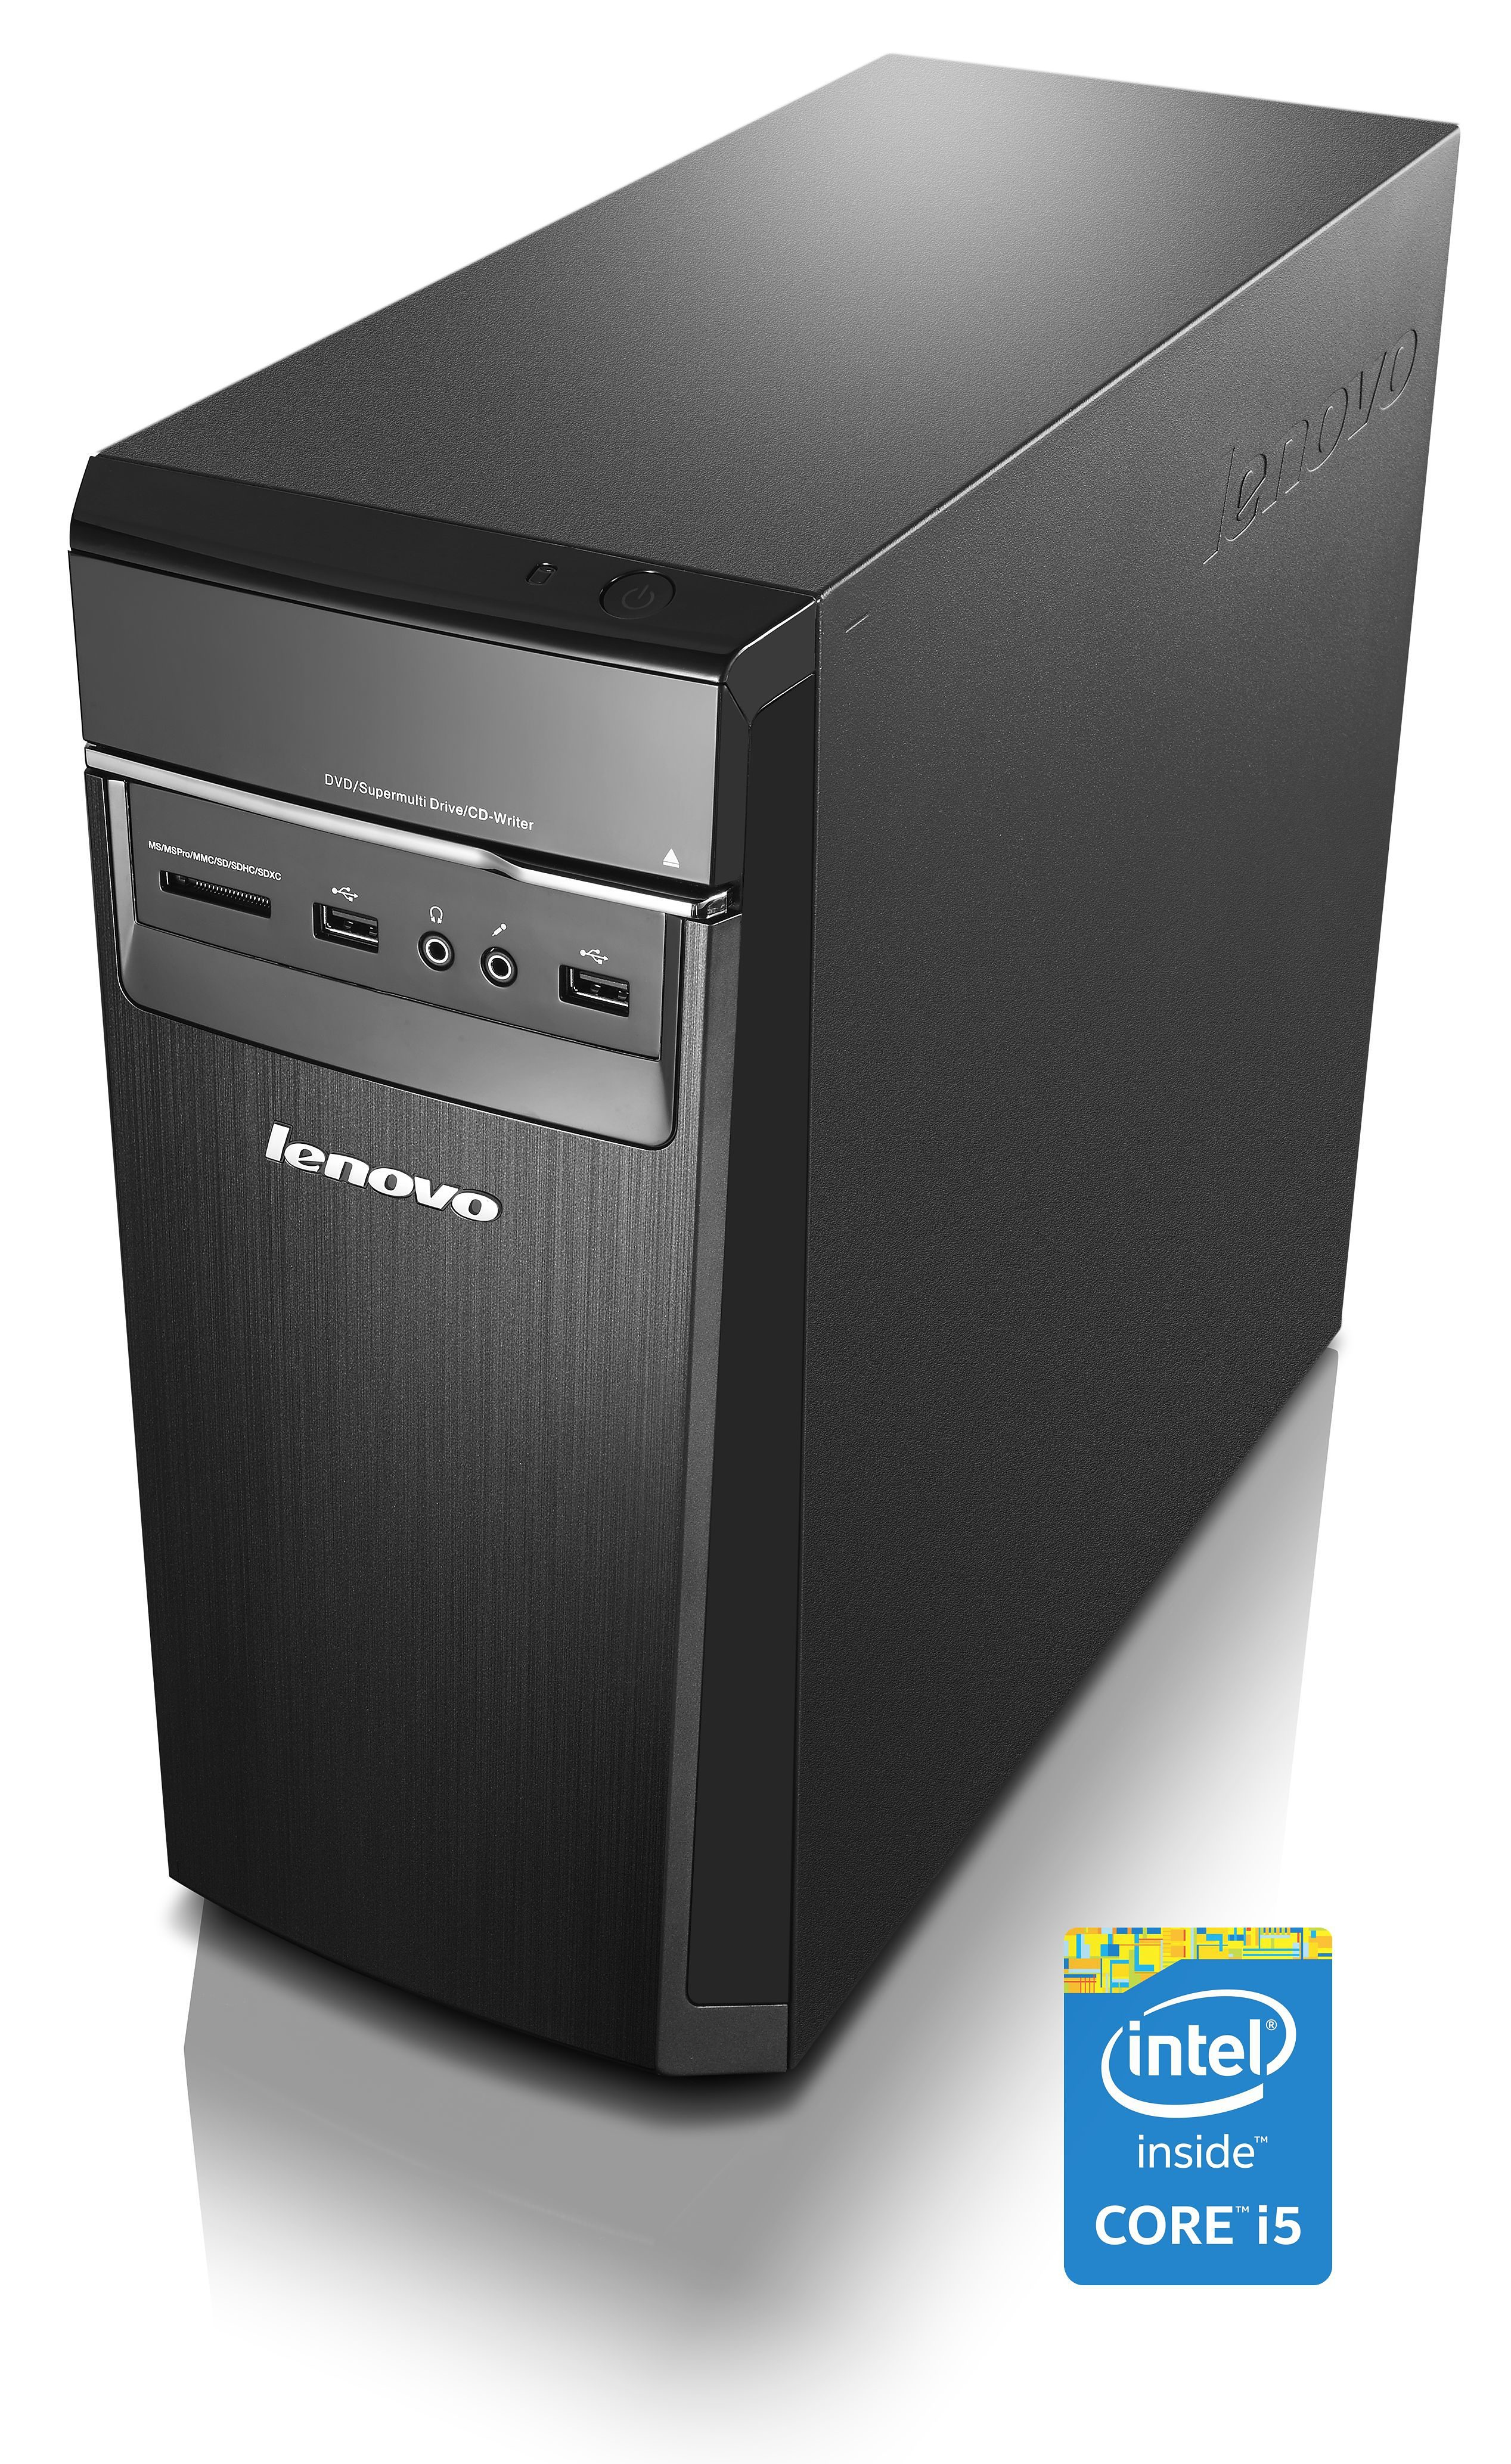 LENOVO IdeaCentre H50-50 Desktop-PC »Intel Core i5, Nvidia GTX 750Ti, 1TB+8GB, 8GB«